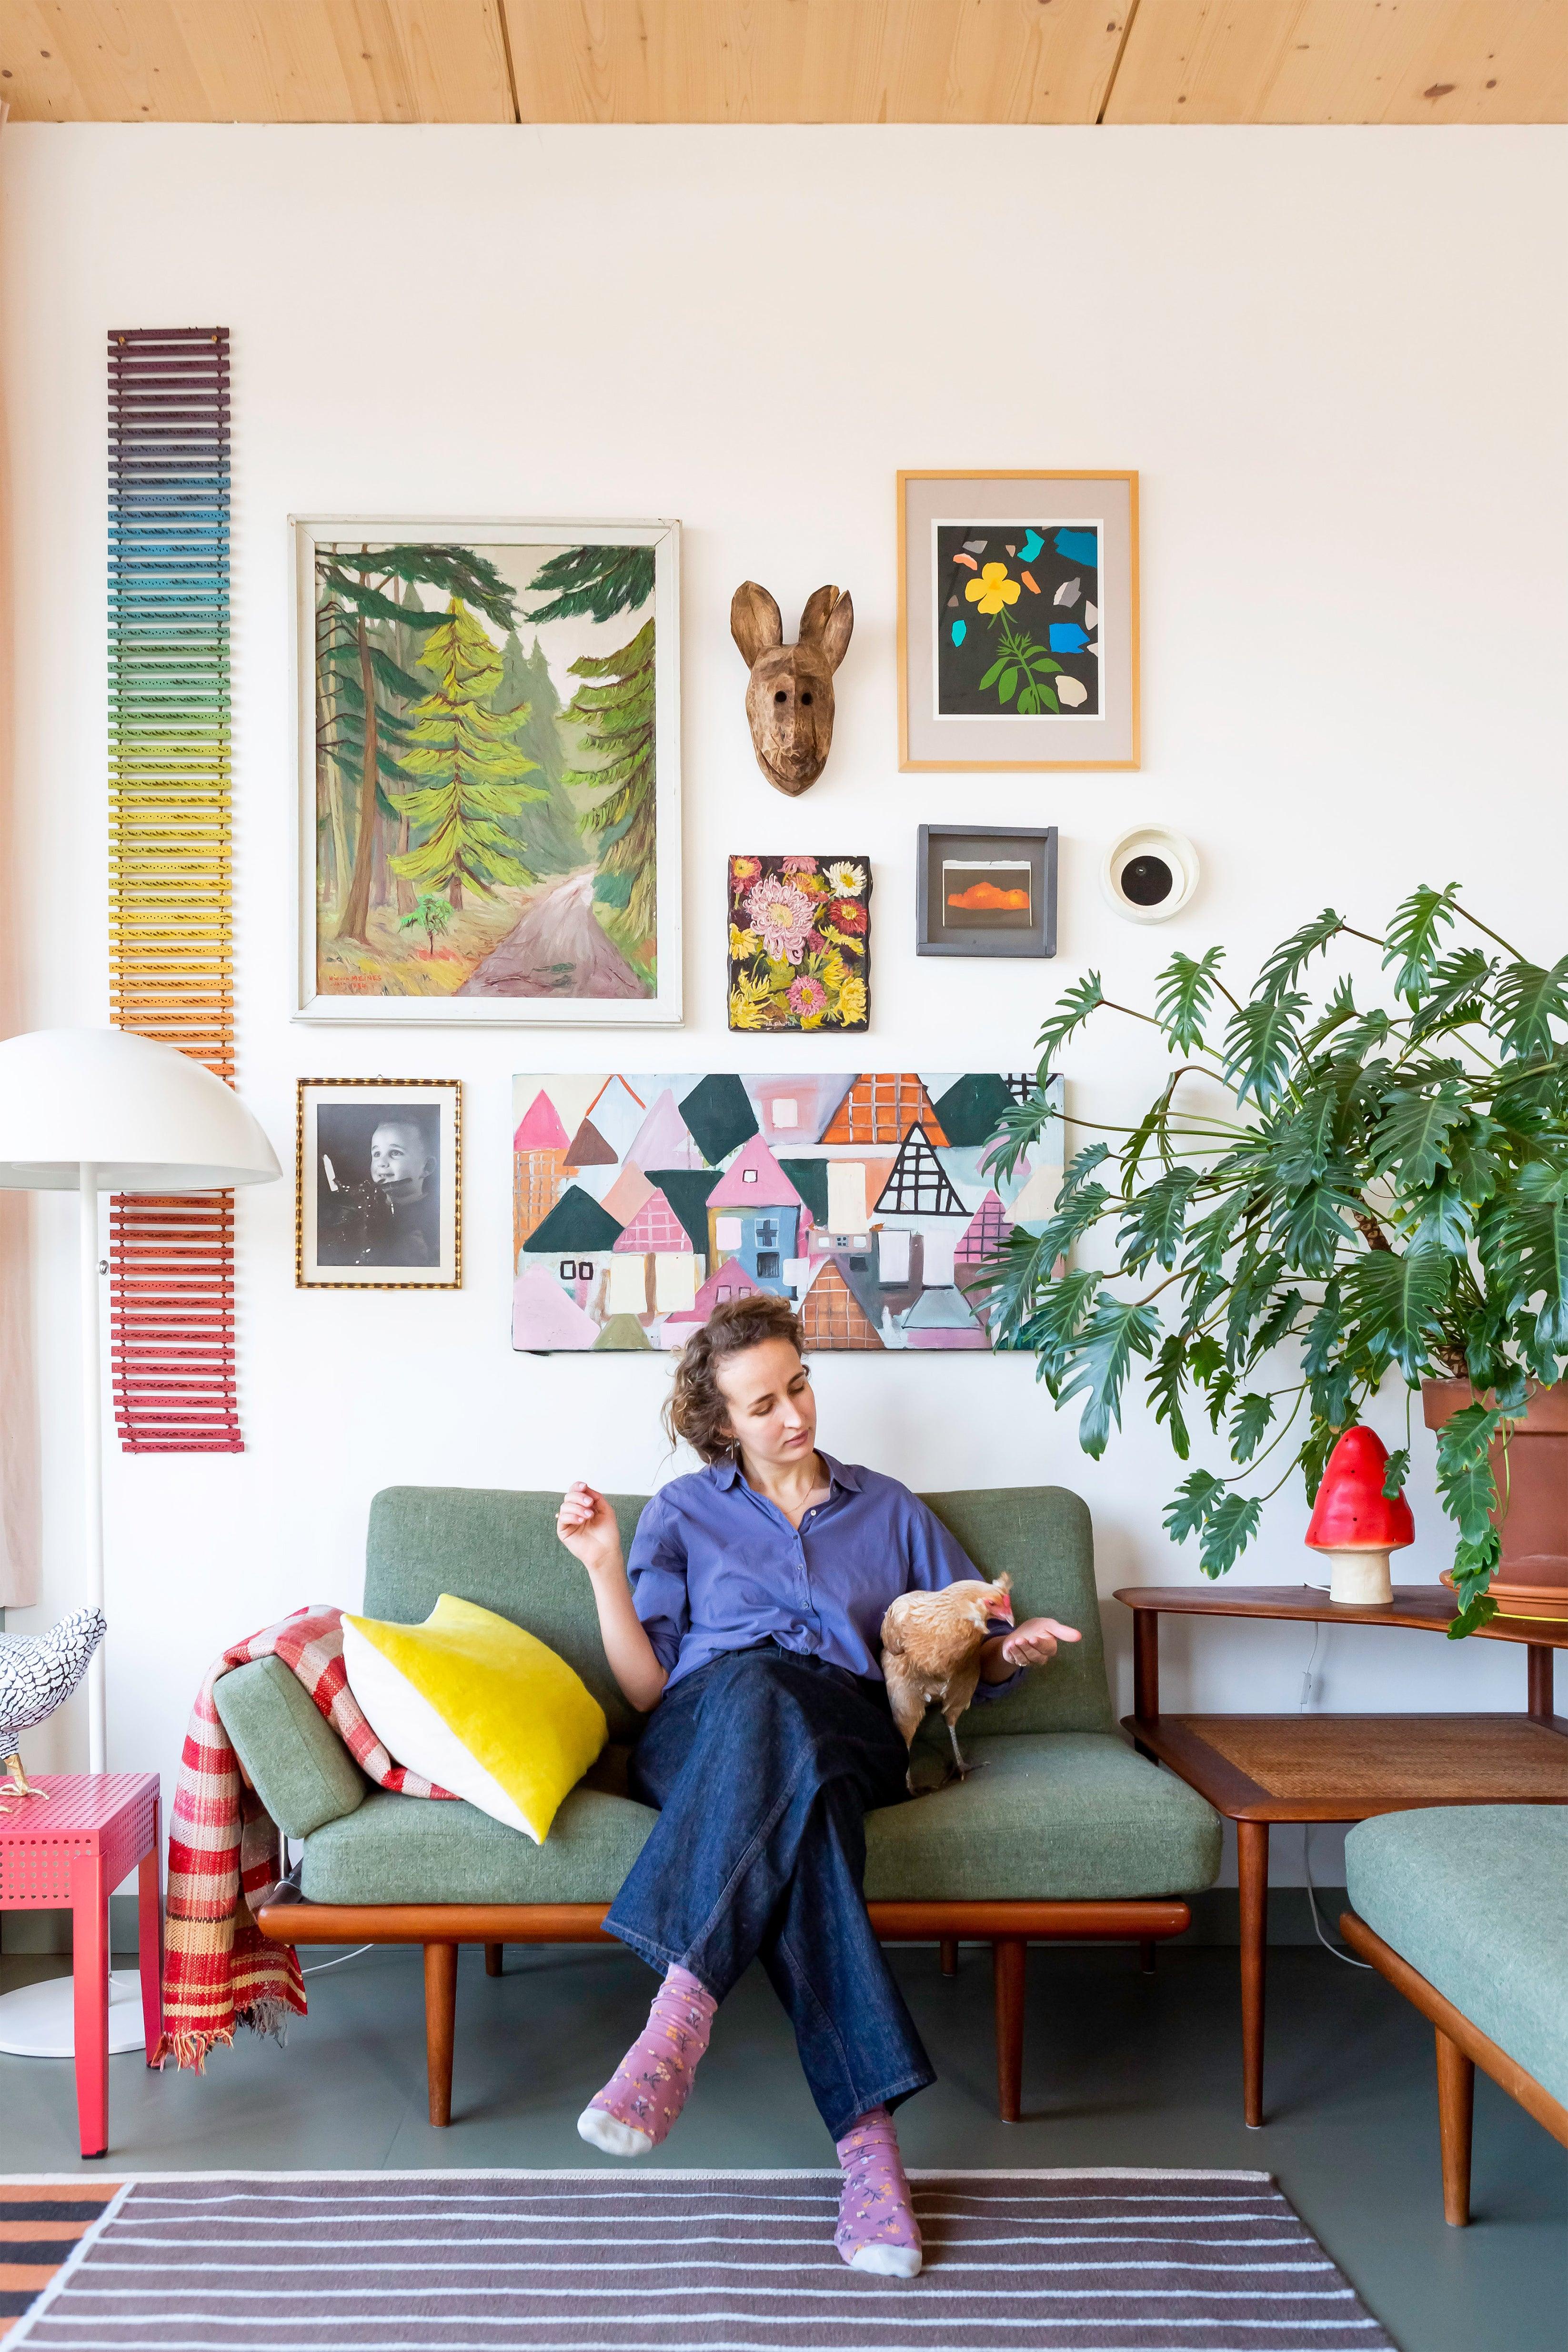 Foekje Fleur sitting on her sofa in front of a gallery wall